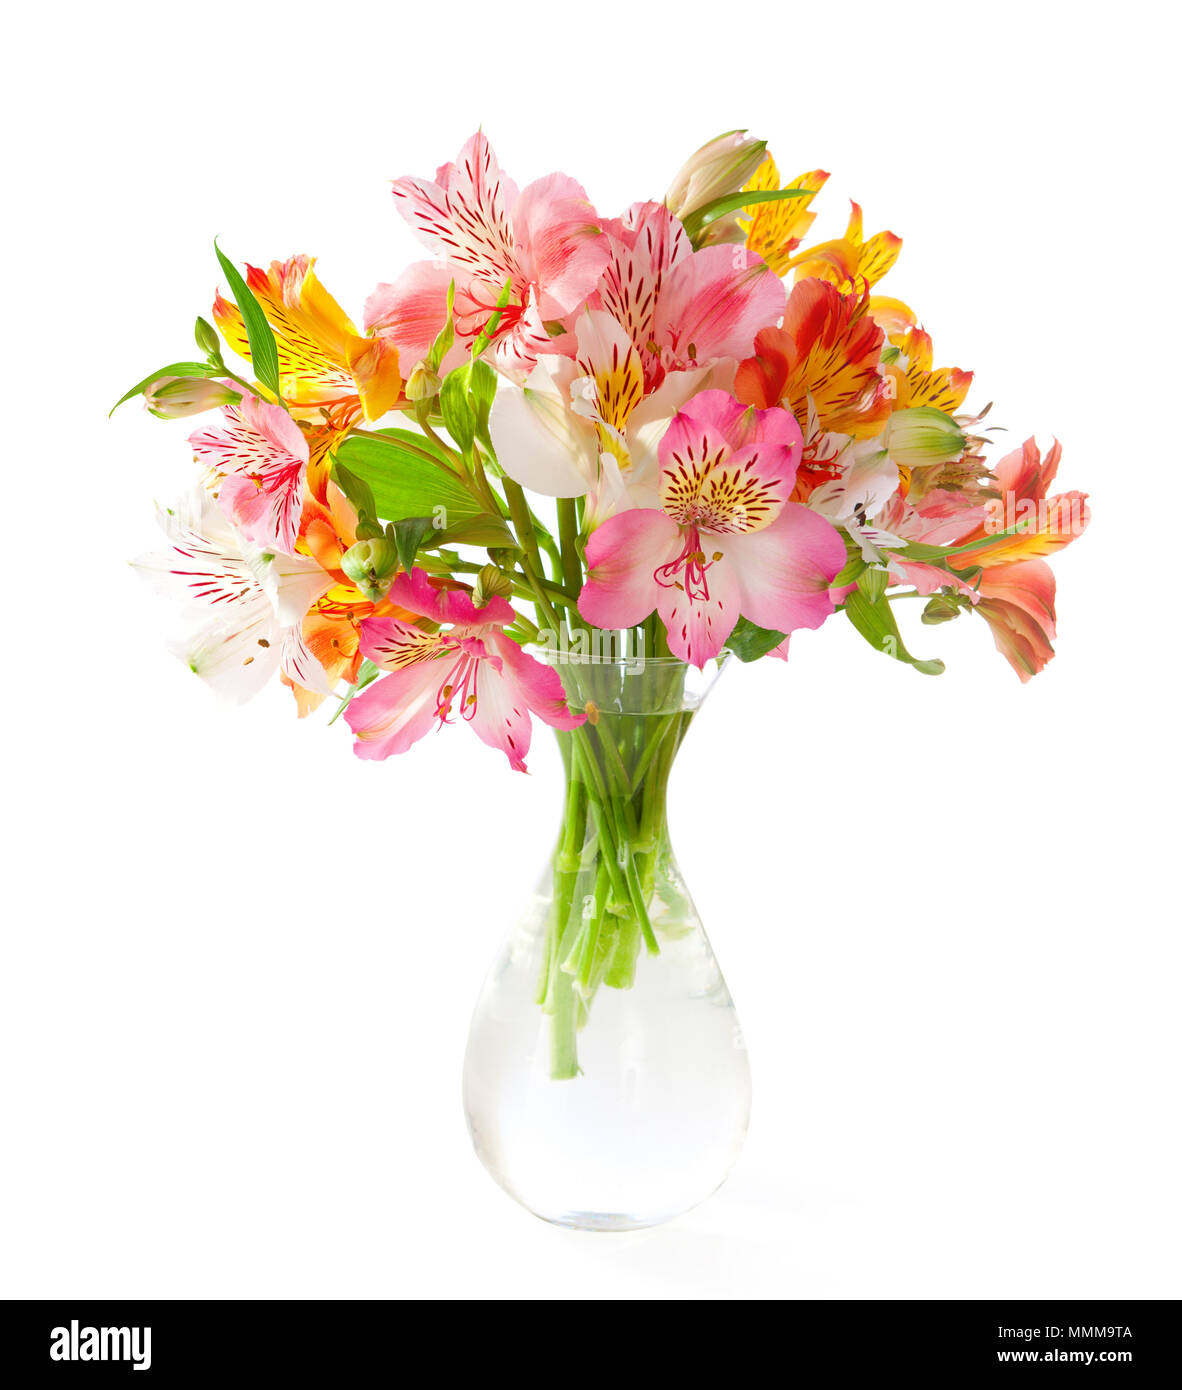 Ramo De Alstroemeria Coloridas Flores En Un Jarron De Cristal